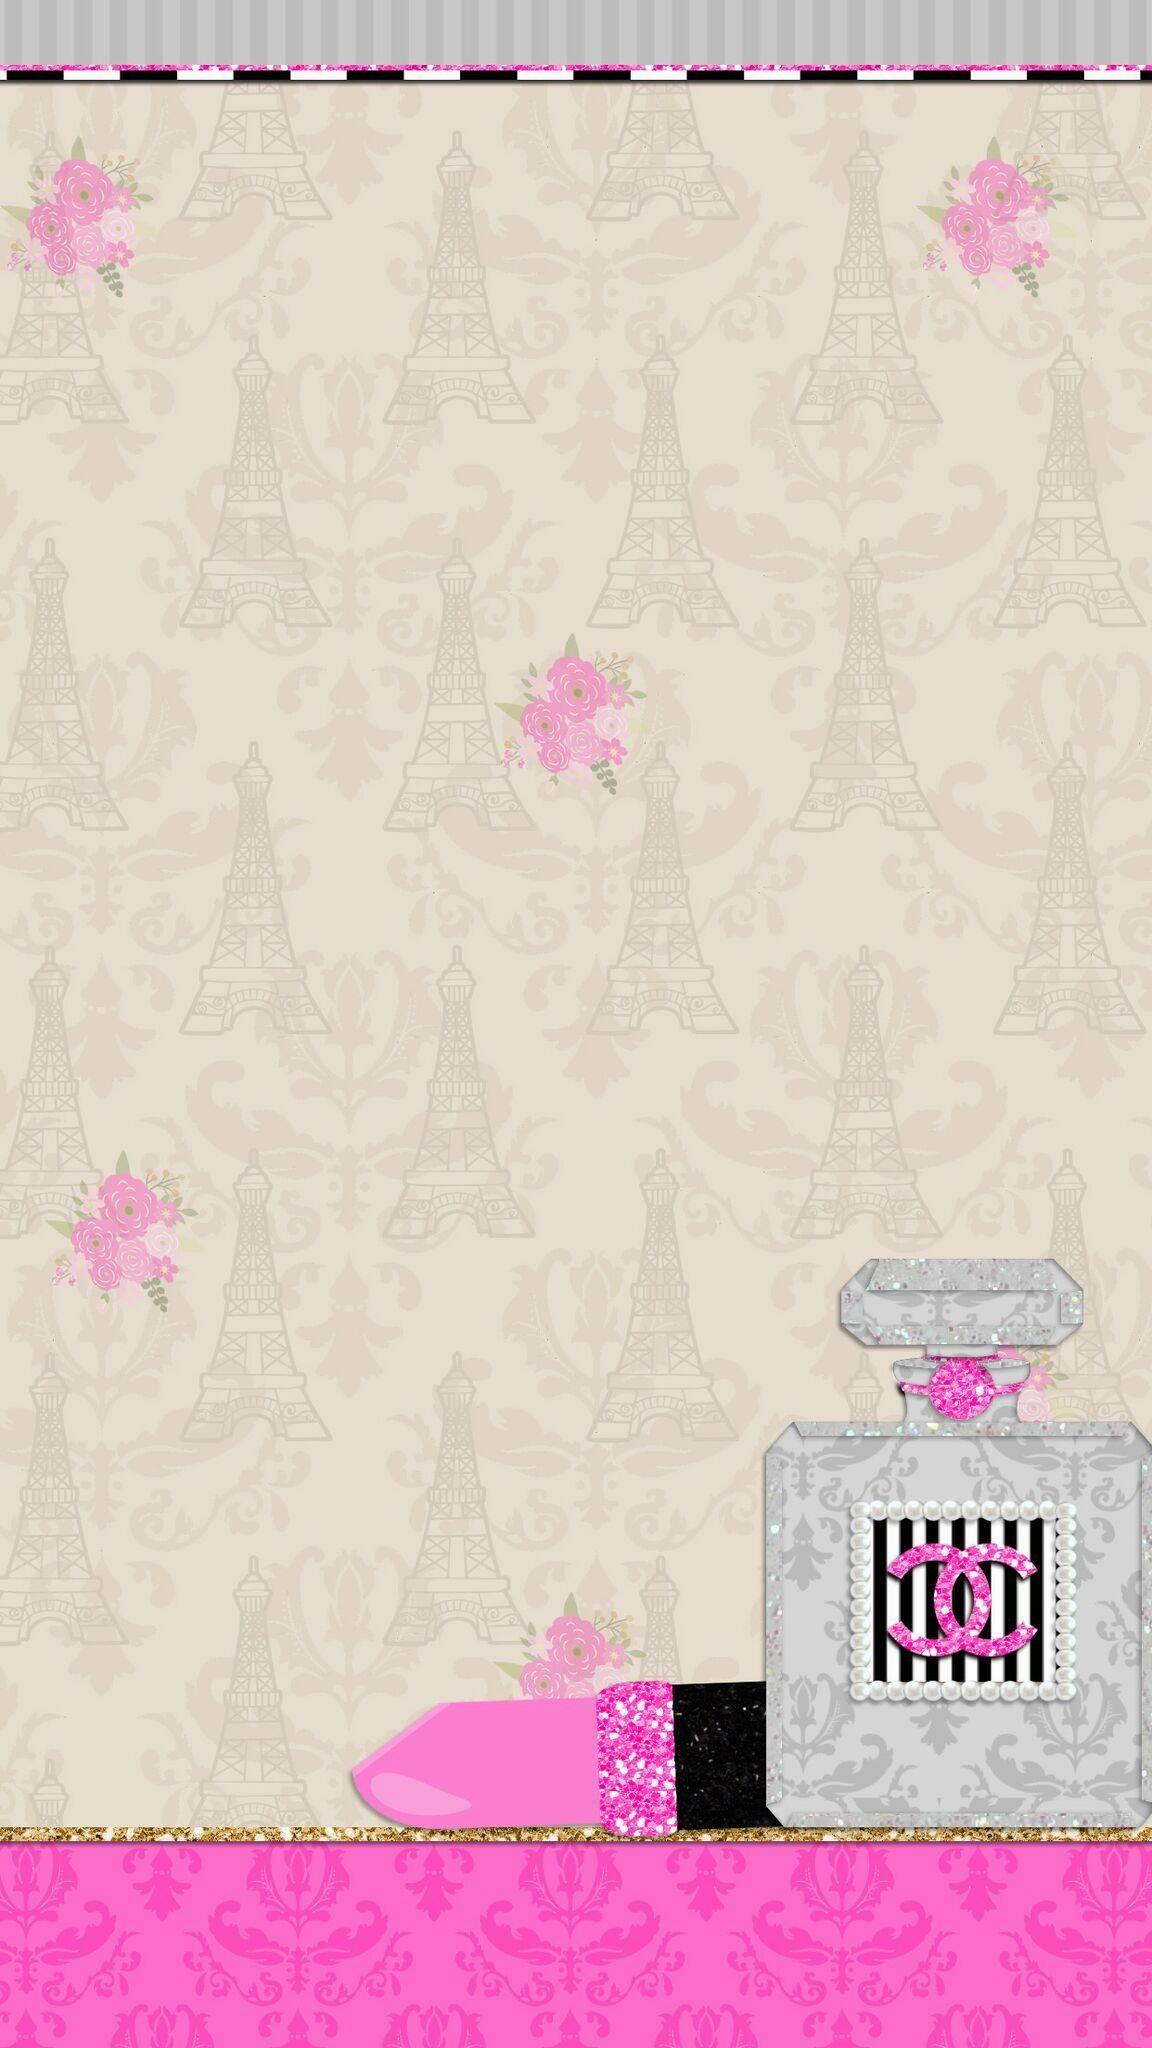 Bonjour-love-Dropbox-wallpaper